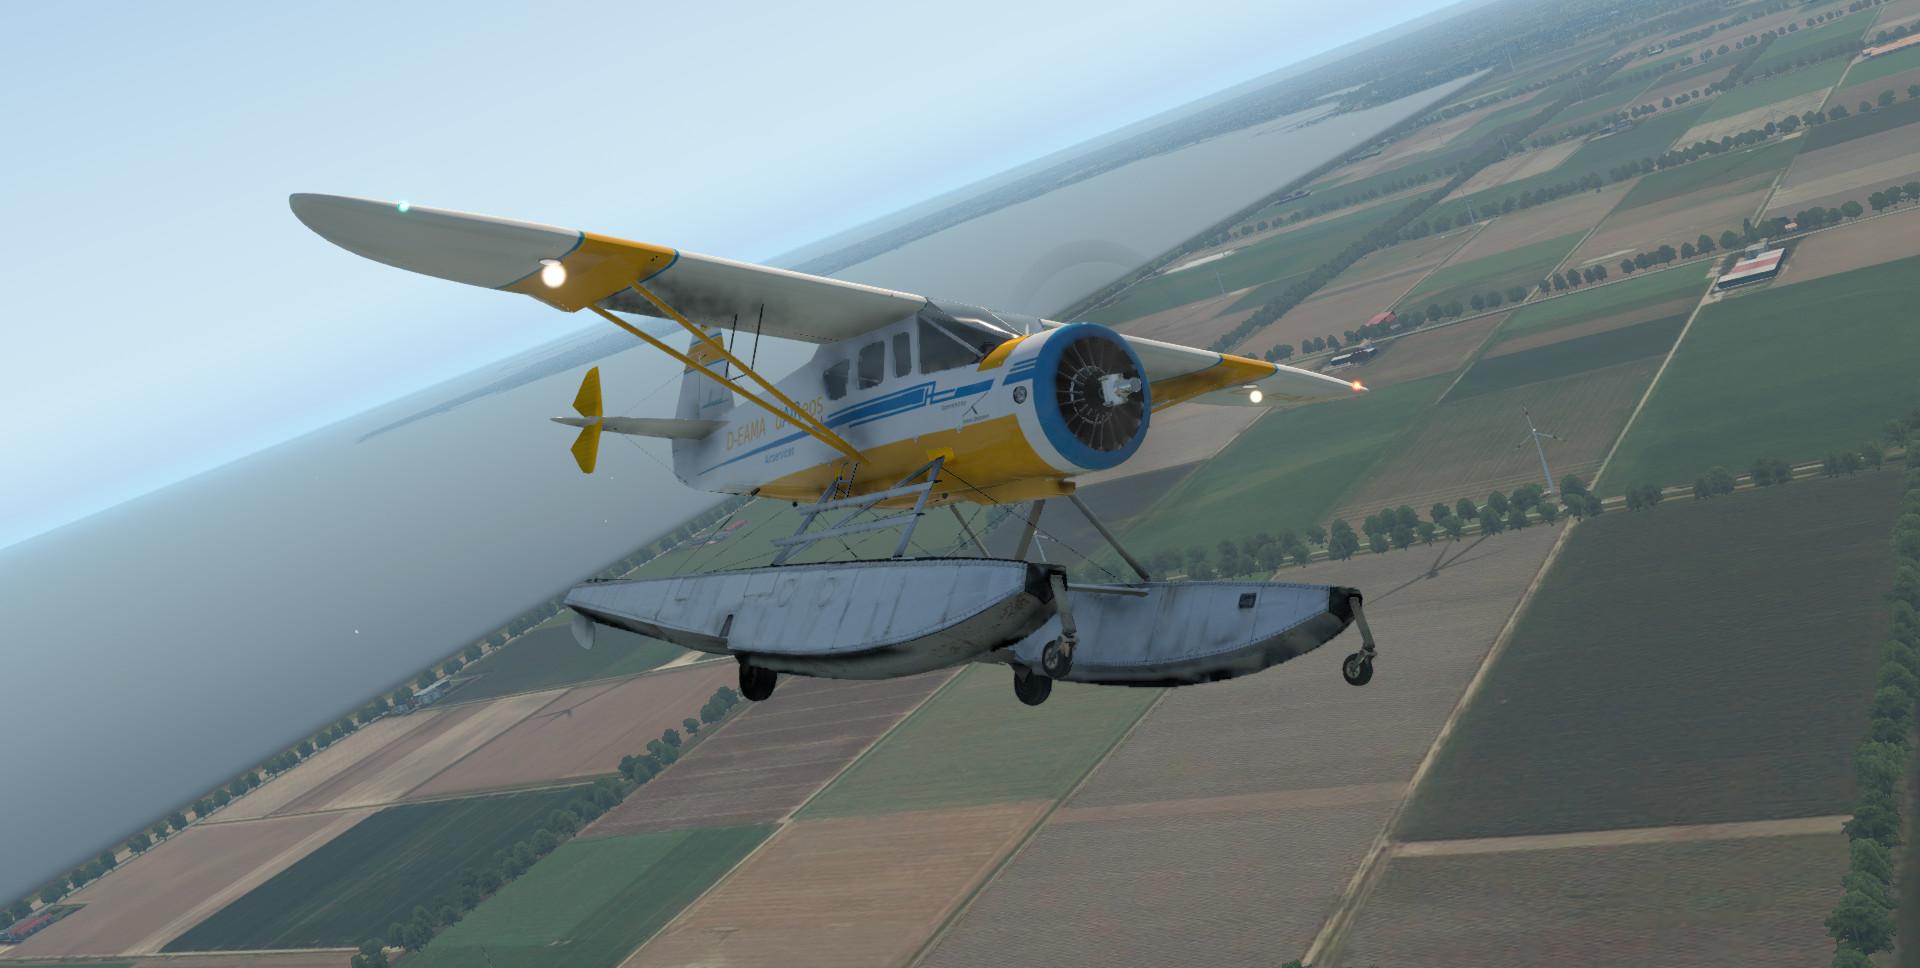 nordseerundflug-0423okce.jpg